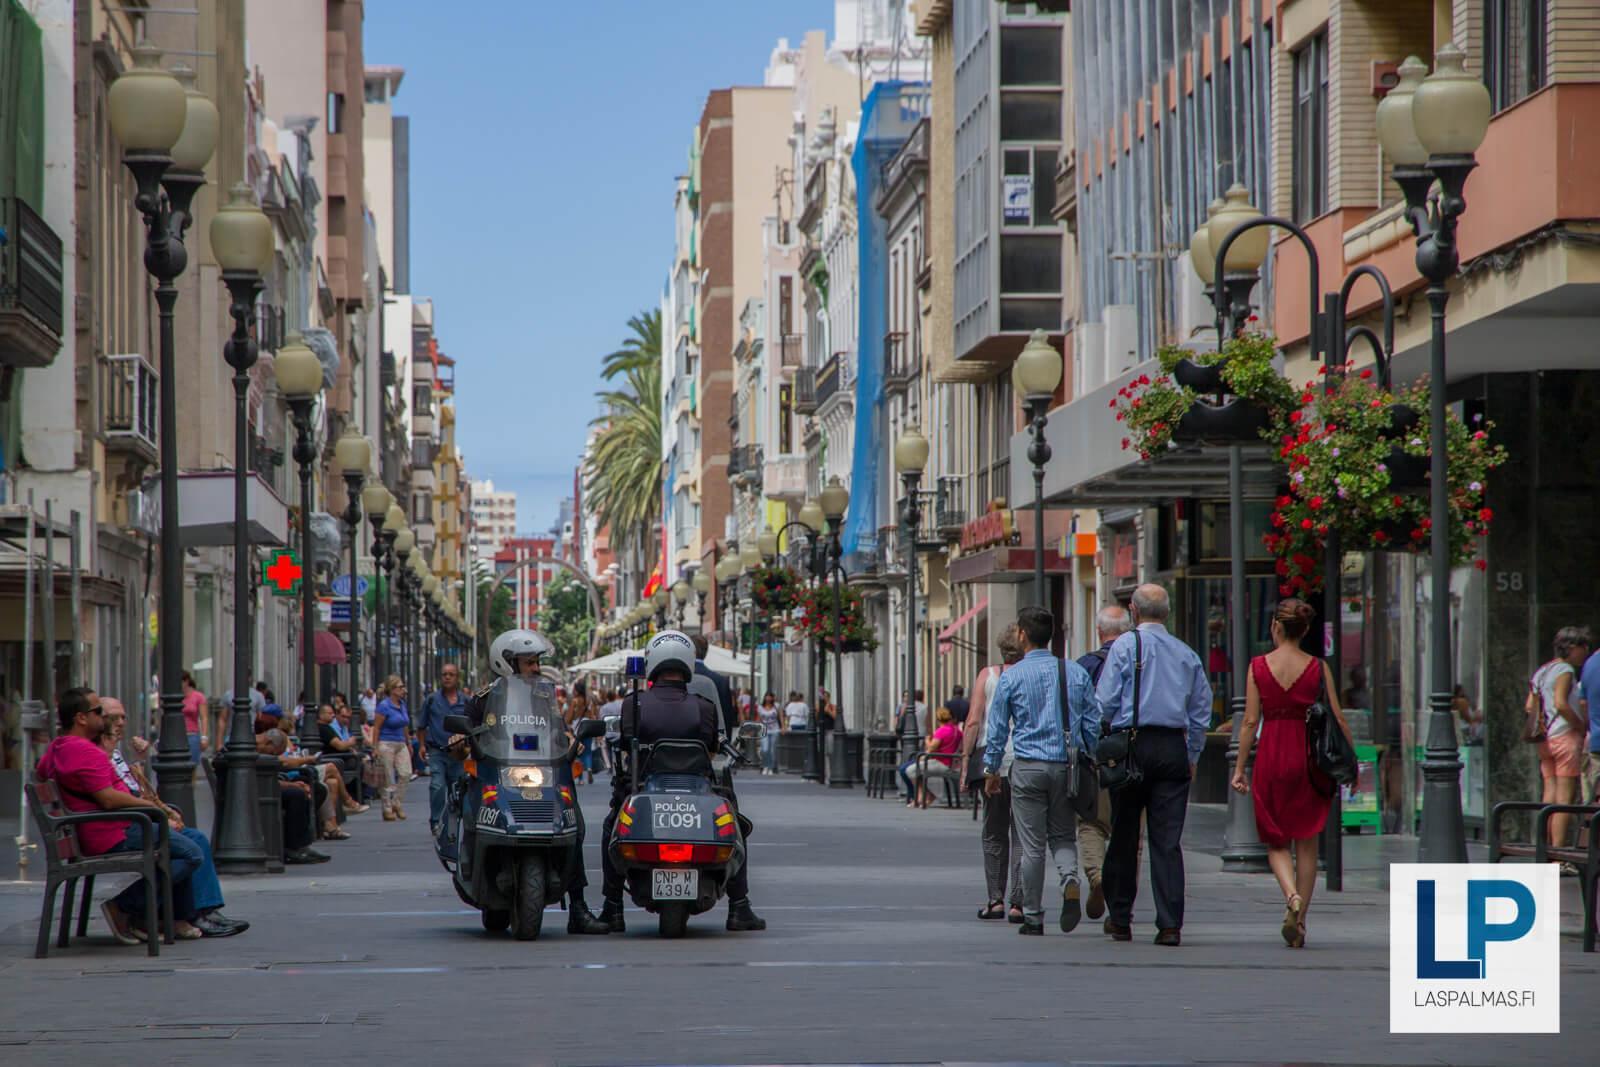 Parhaat ostoskadut Las Palmas, Gran Canaria